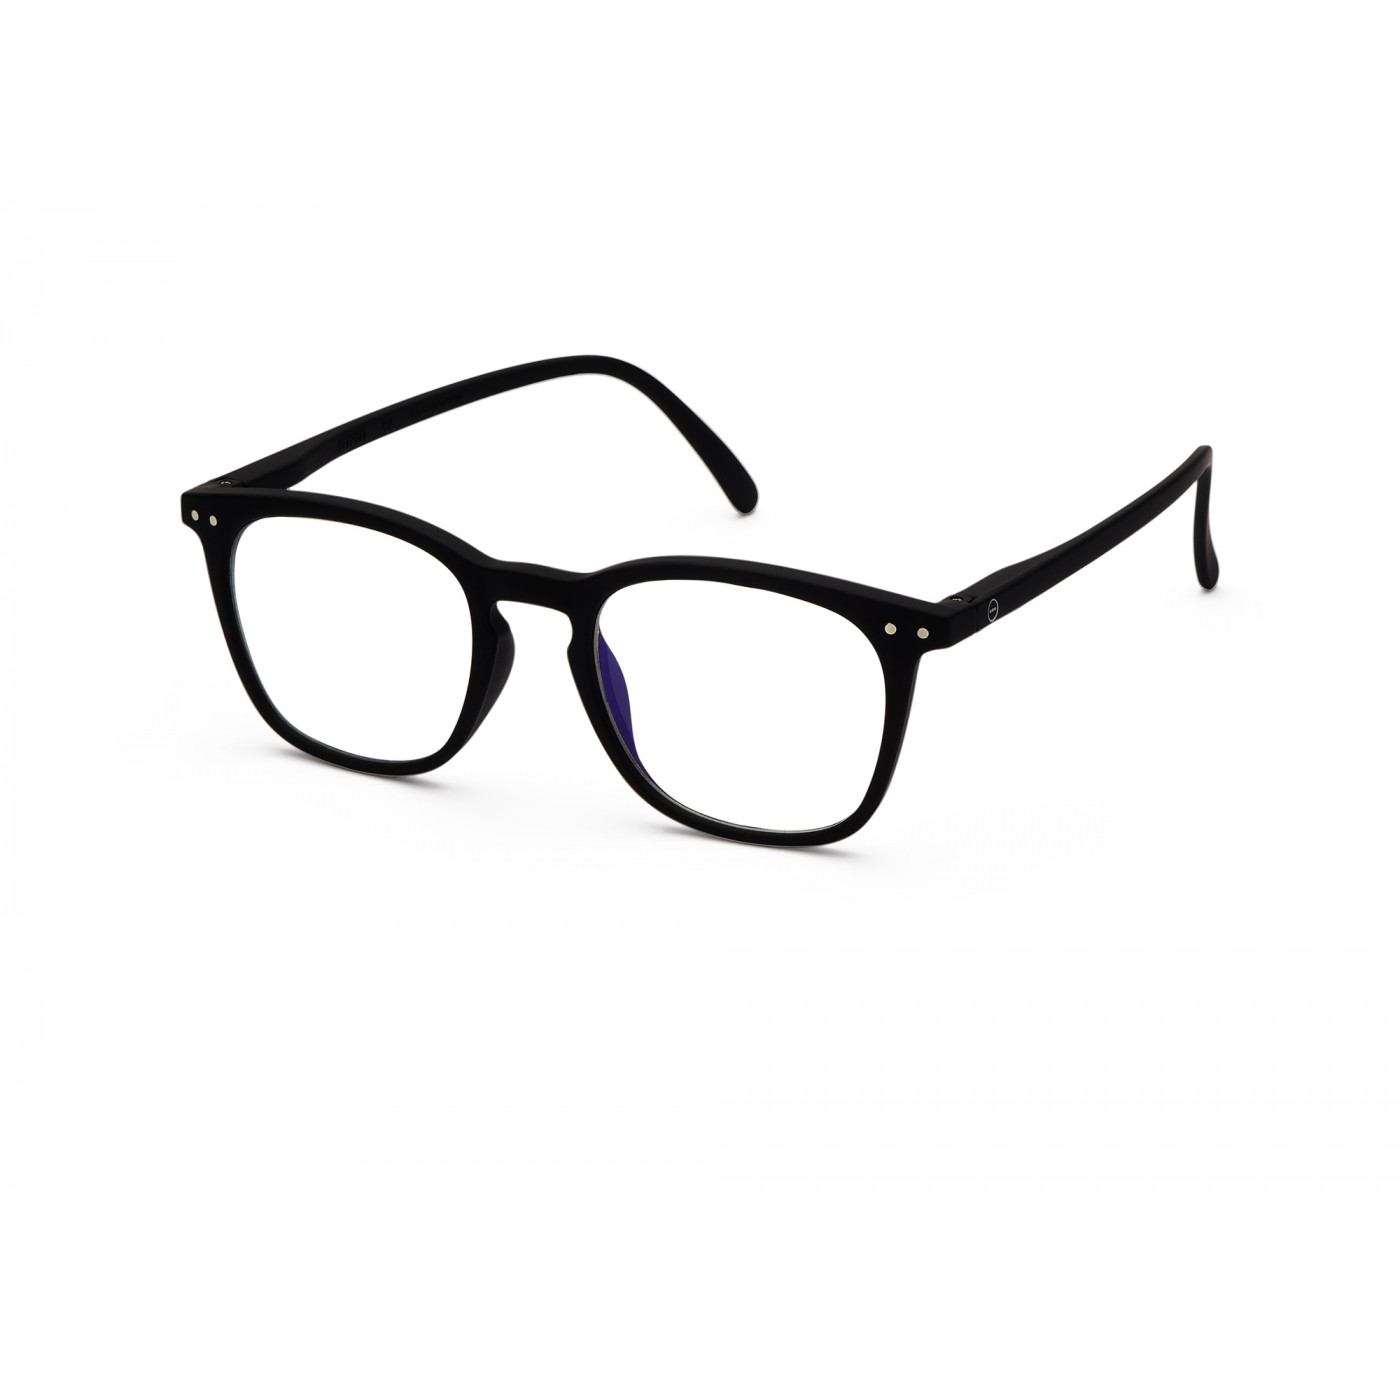 Izipizi #E Screen Protection Glasses in Black